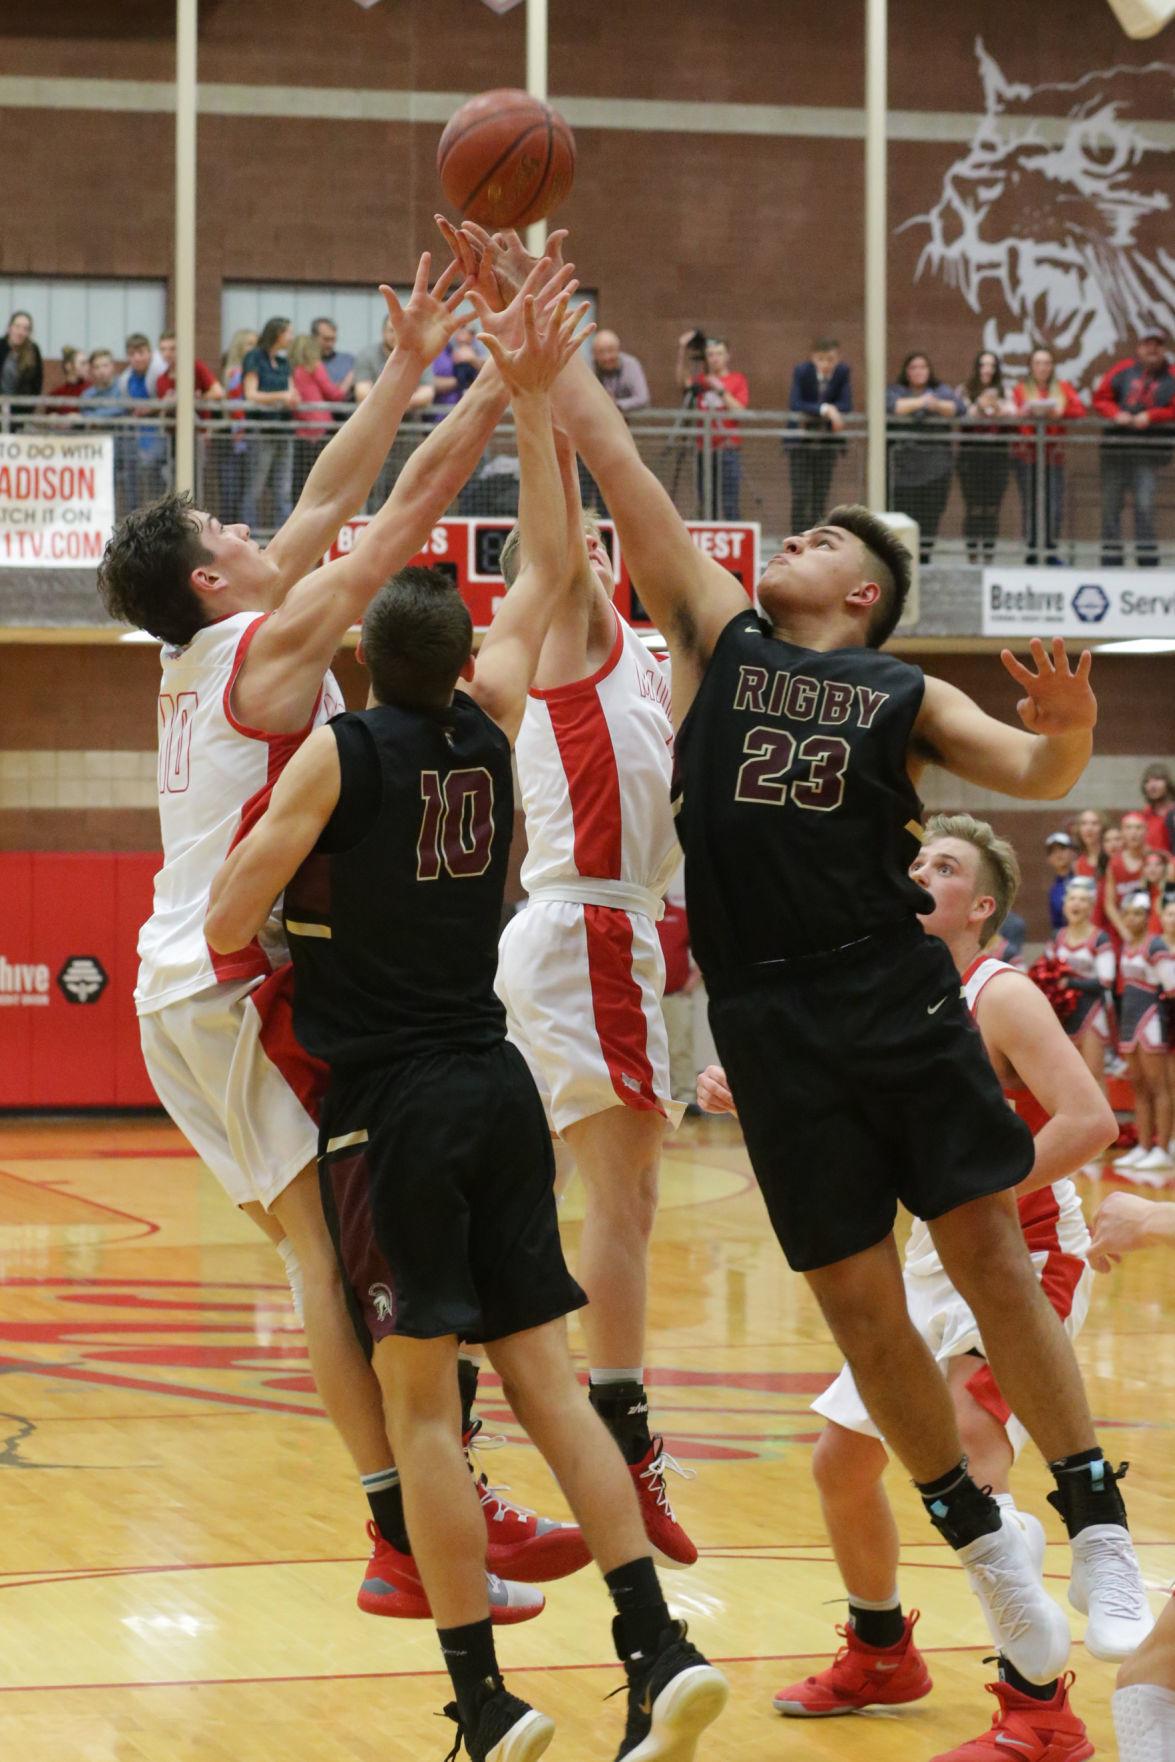 Madison vs Rigby boys basketball